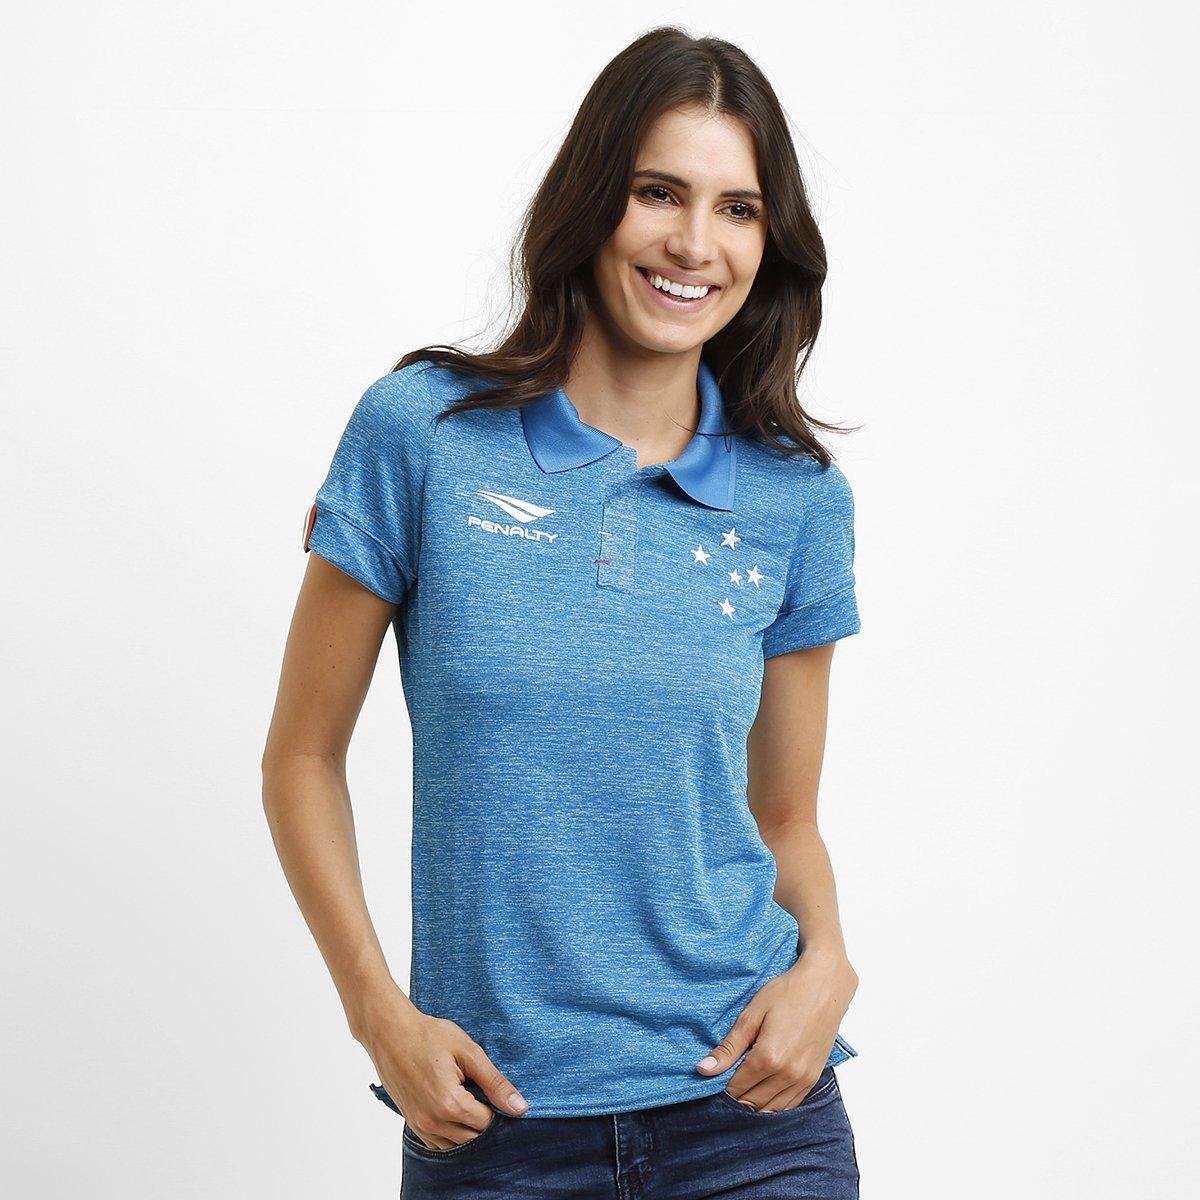 d5c20b0edd822 Camisa Feminina Penalty Cruzeiro III 15 16 s nº - Compre Agora ...